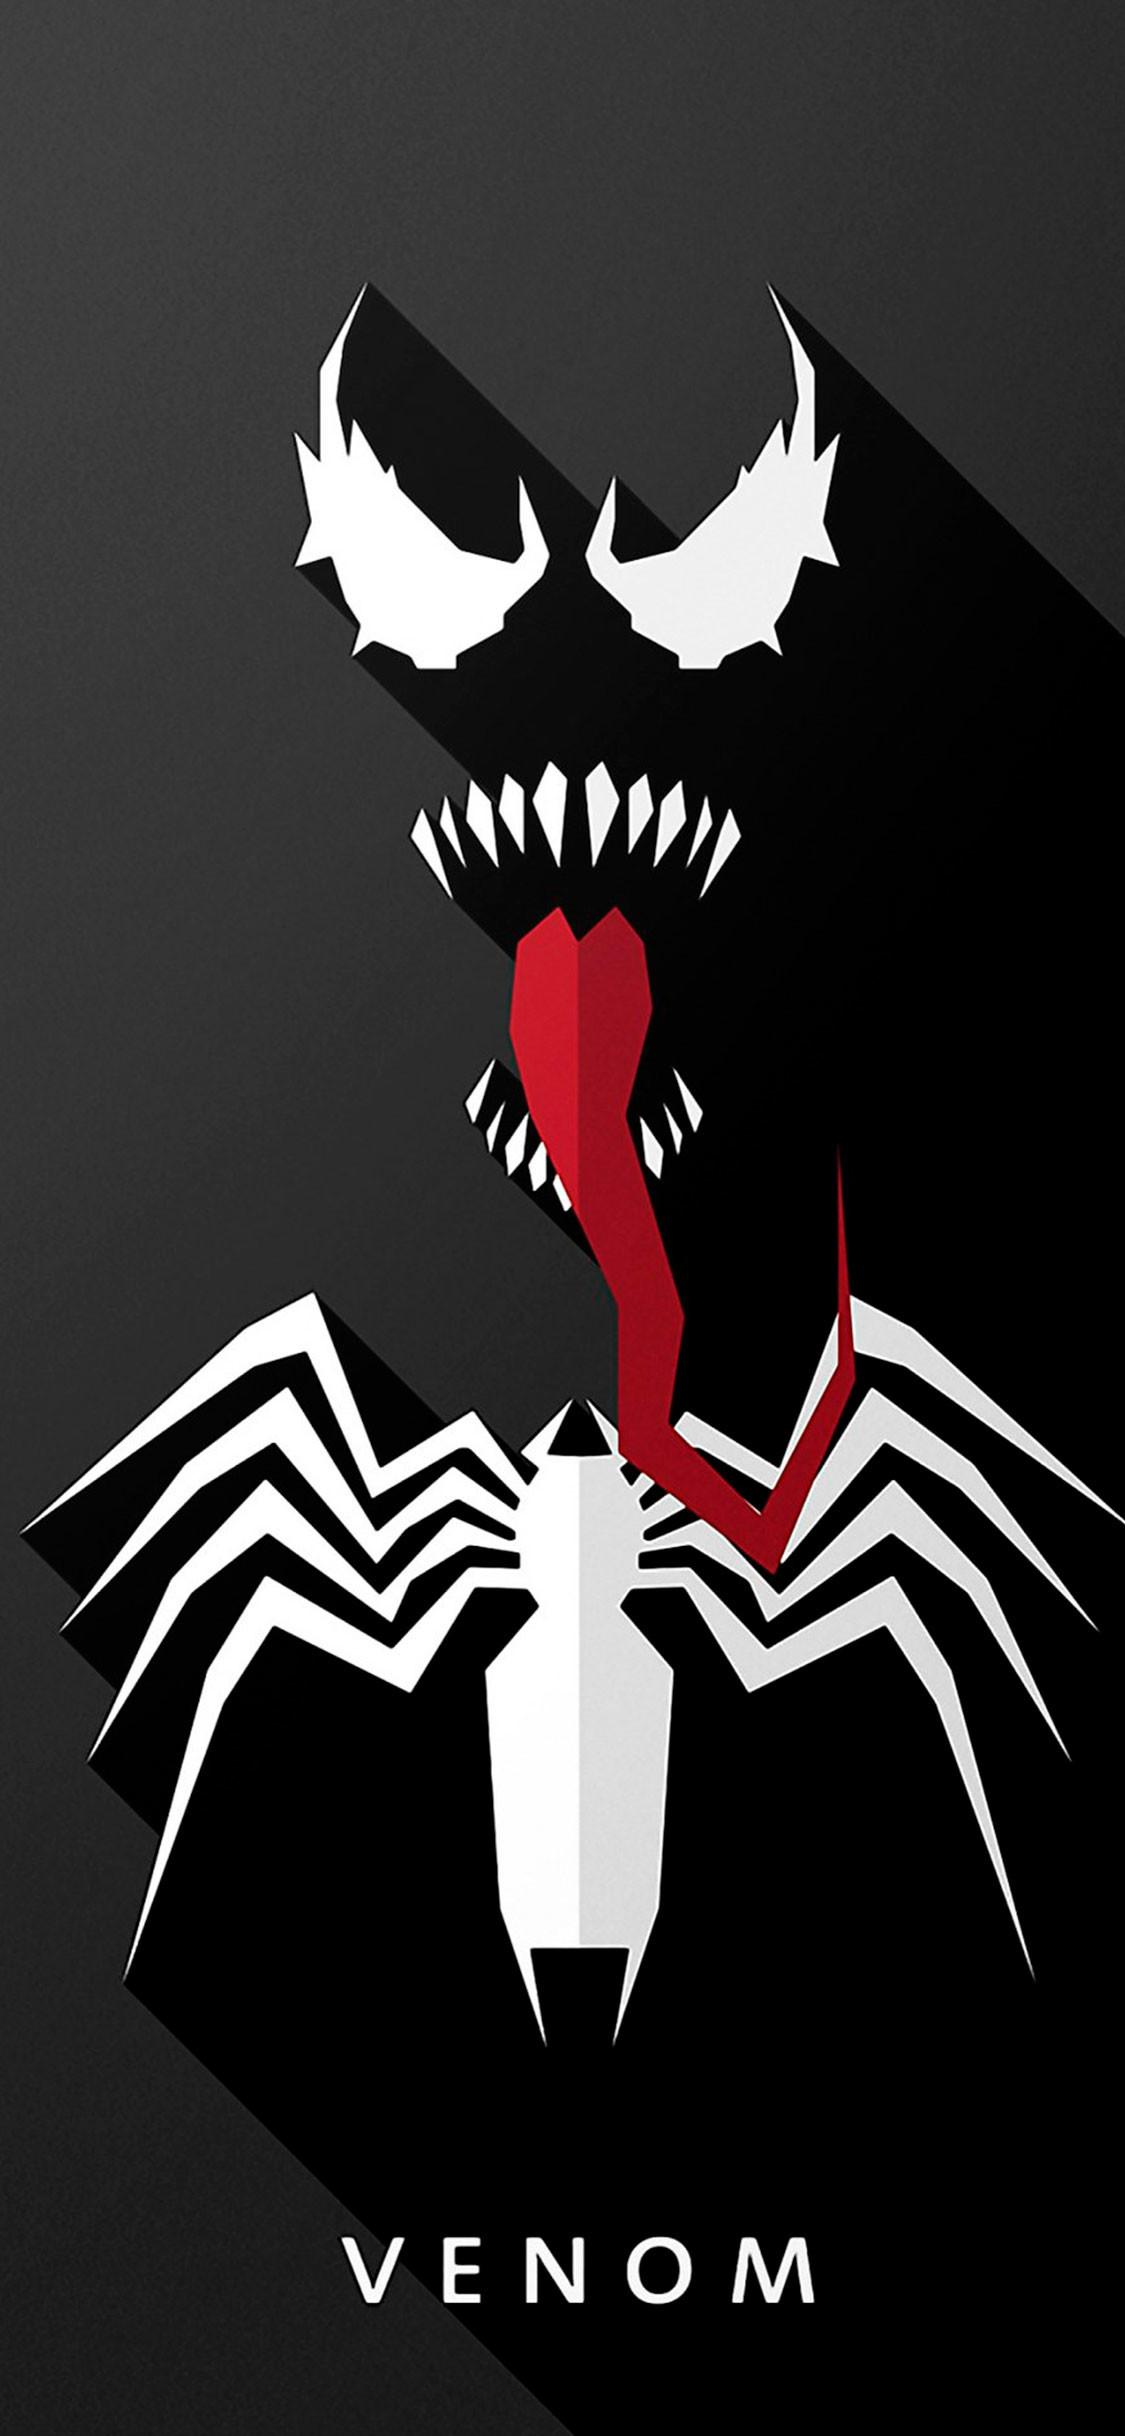 Venom 4k Iphone Wallpapers Wallpaper Cave